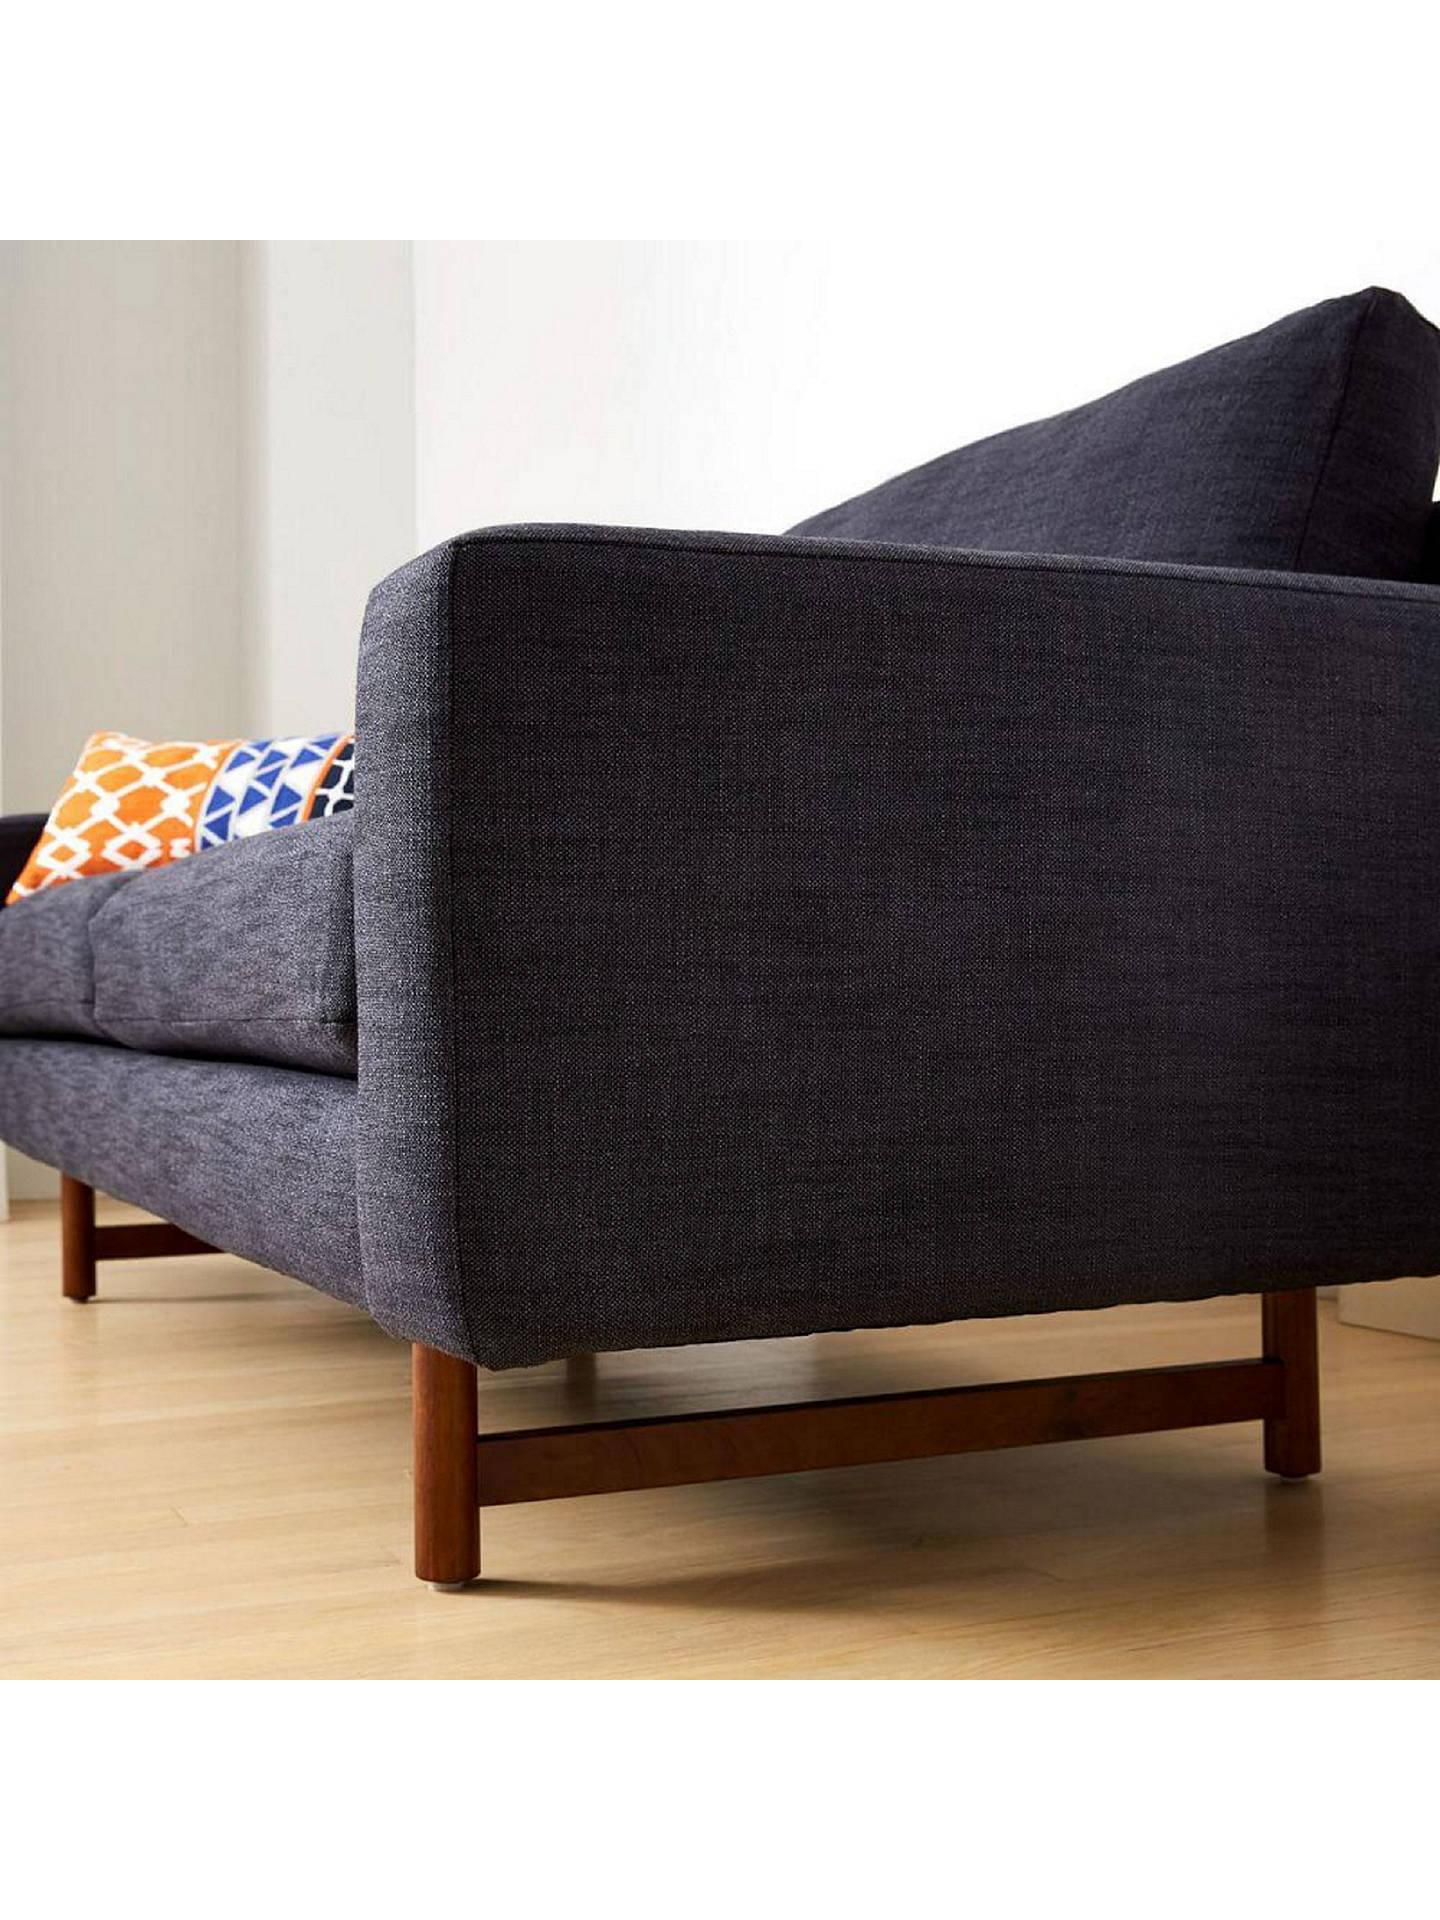 west elm eddy large 3 seater sofa at john lewis partners rh johnlewis com Eddy Sofa West Elm Living Room Idea Eddy Sofa West Elm Living Room Idea